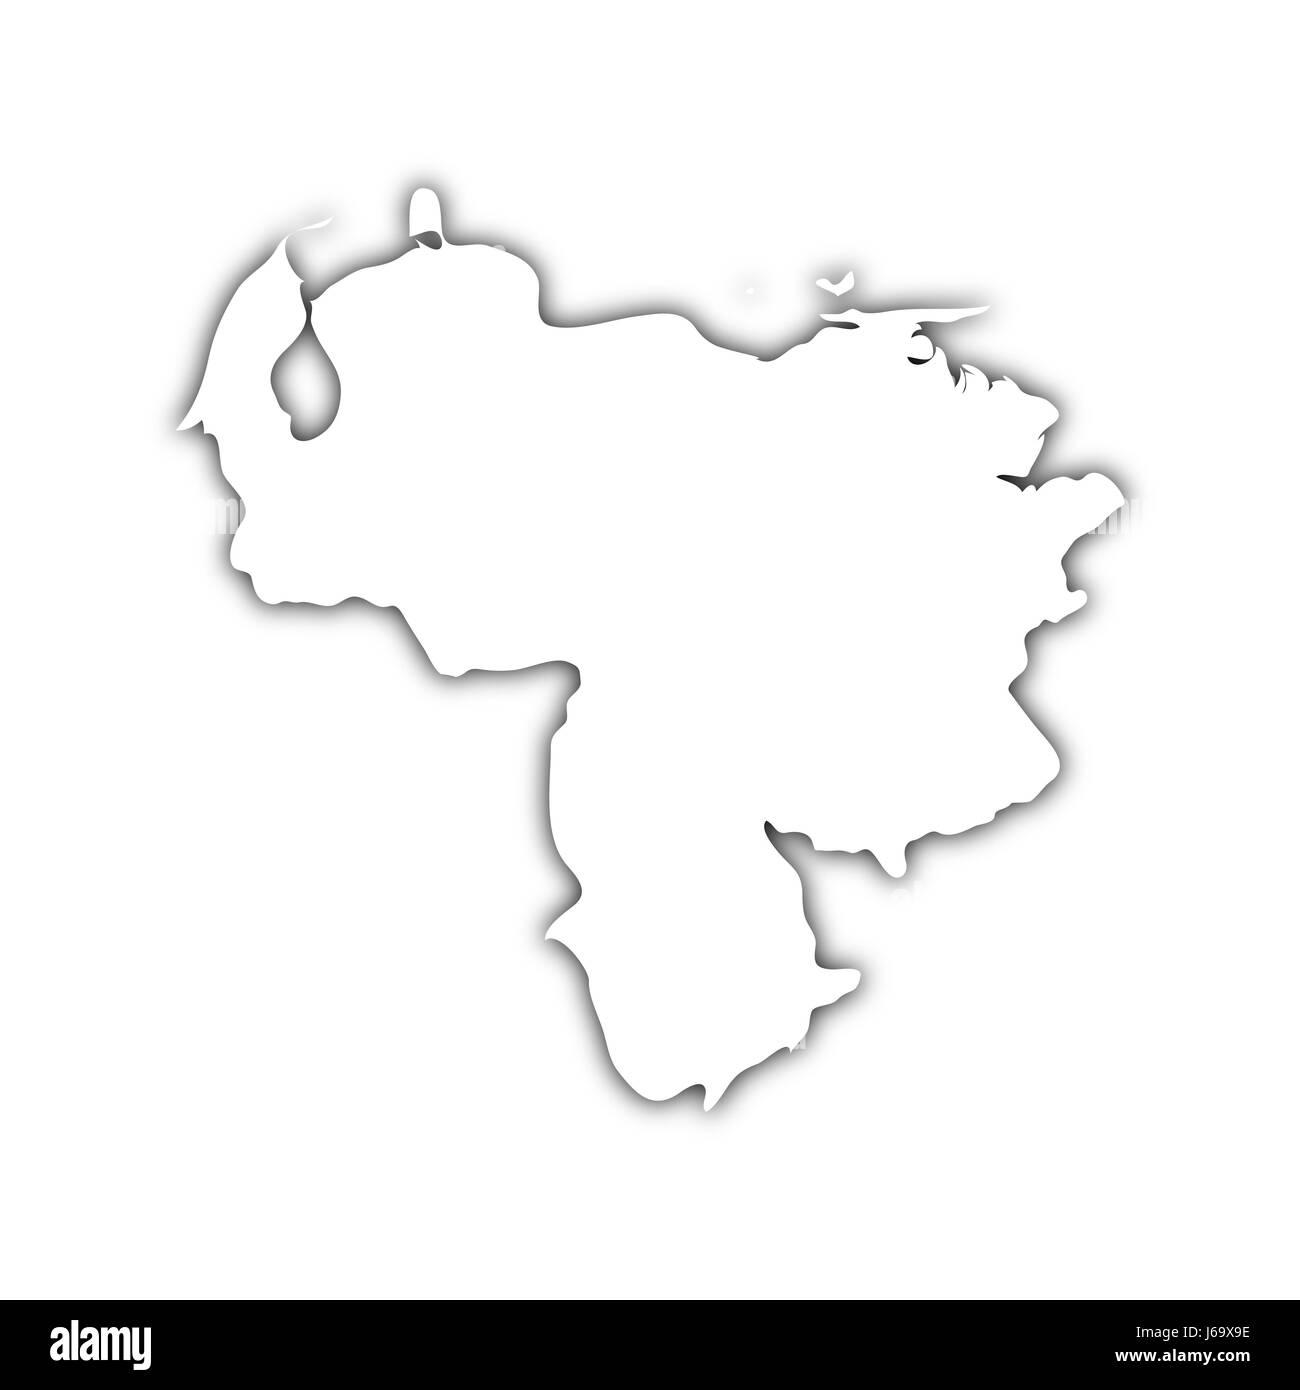 Venezuela Map Black and White Stock Photos & Images - Alamy